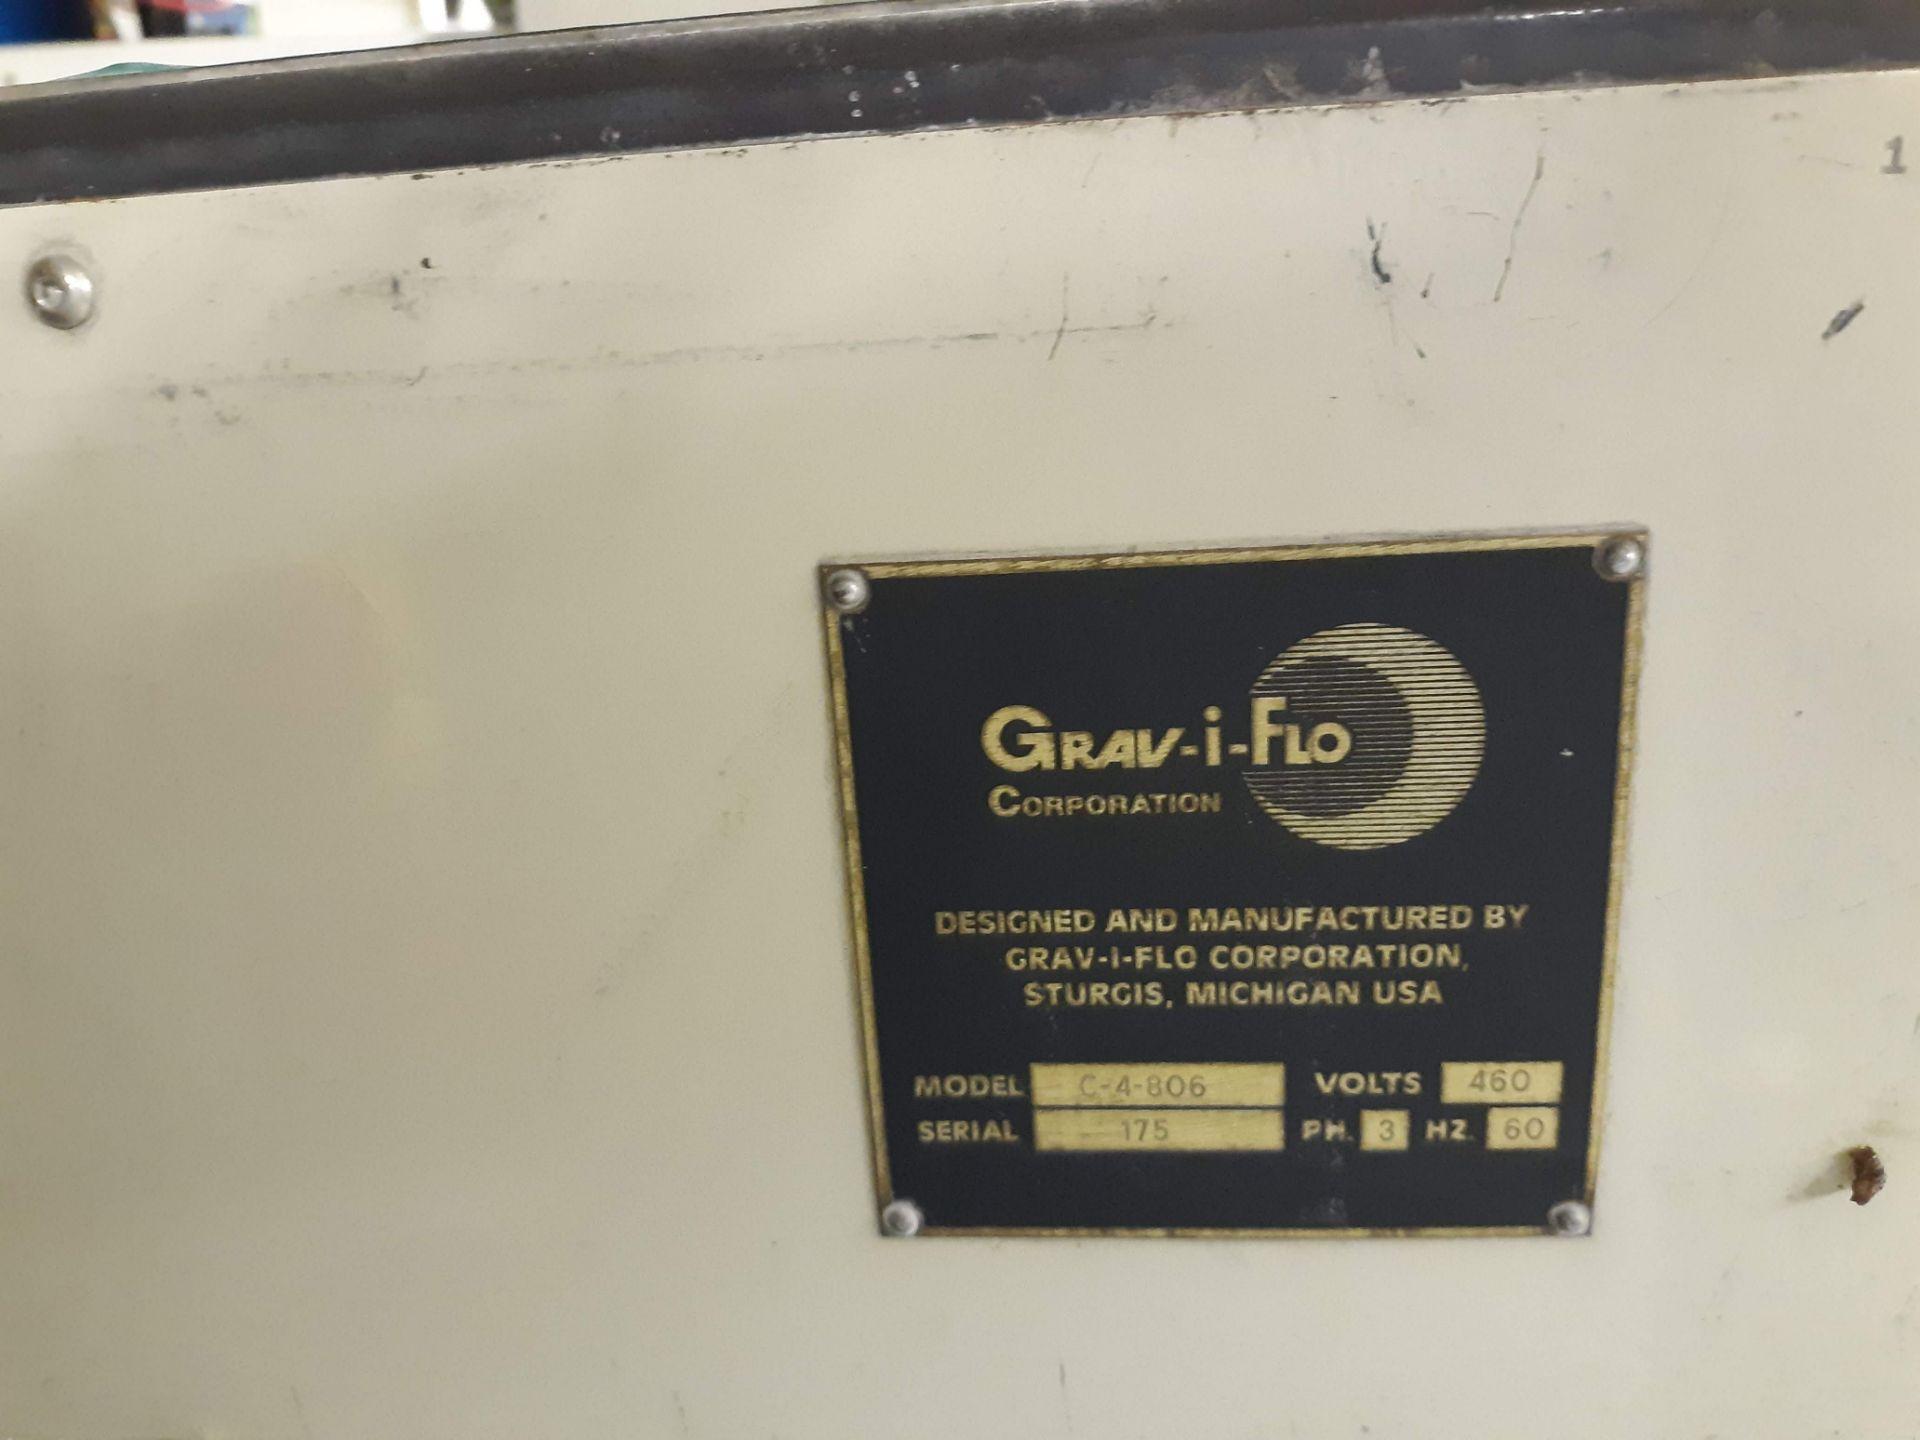 Lot 1238 - GRAV-I-FLO CENTRIFUGAL BARREL FINISHING MACHINE MODEL-C-4-806 S#175 460V/3PH/60HZ (LOCATED AT: 433